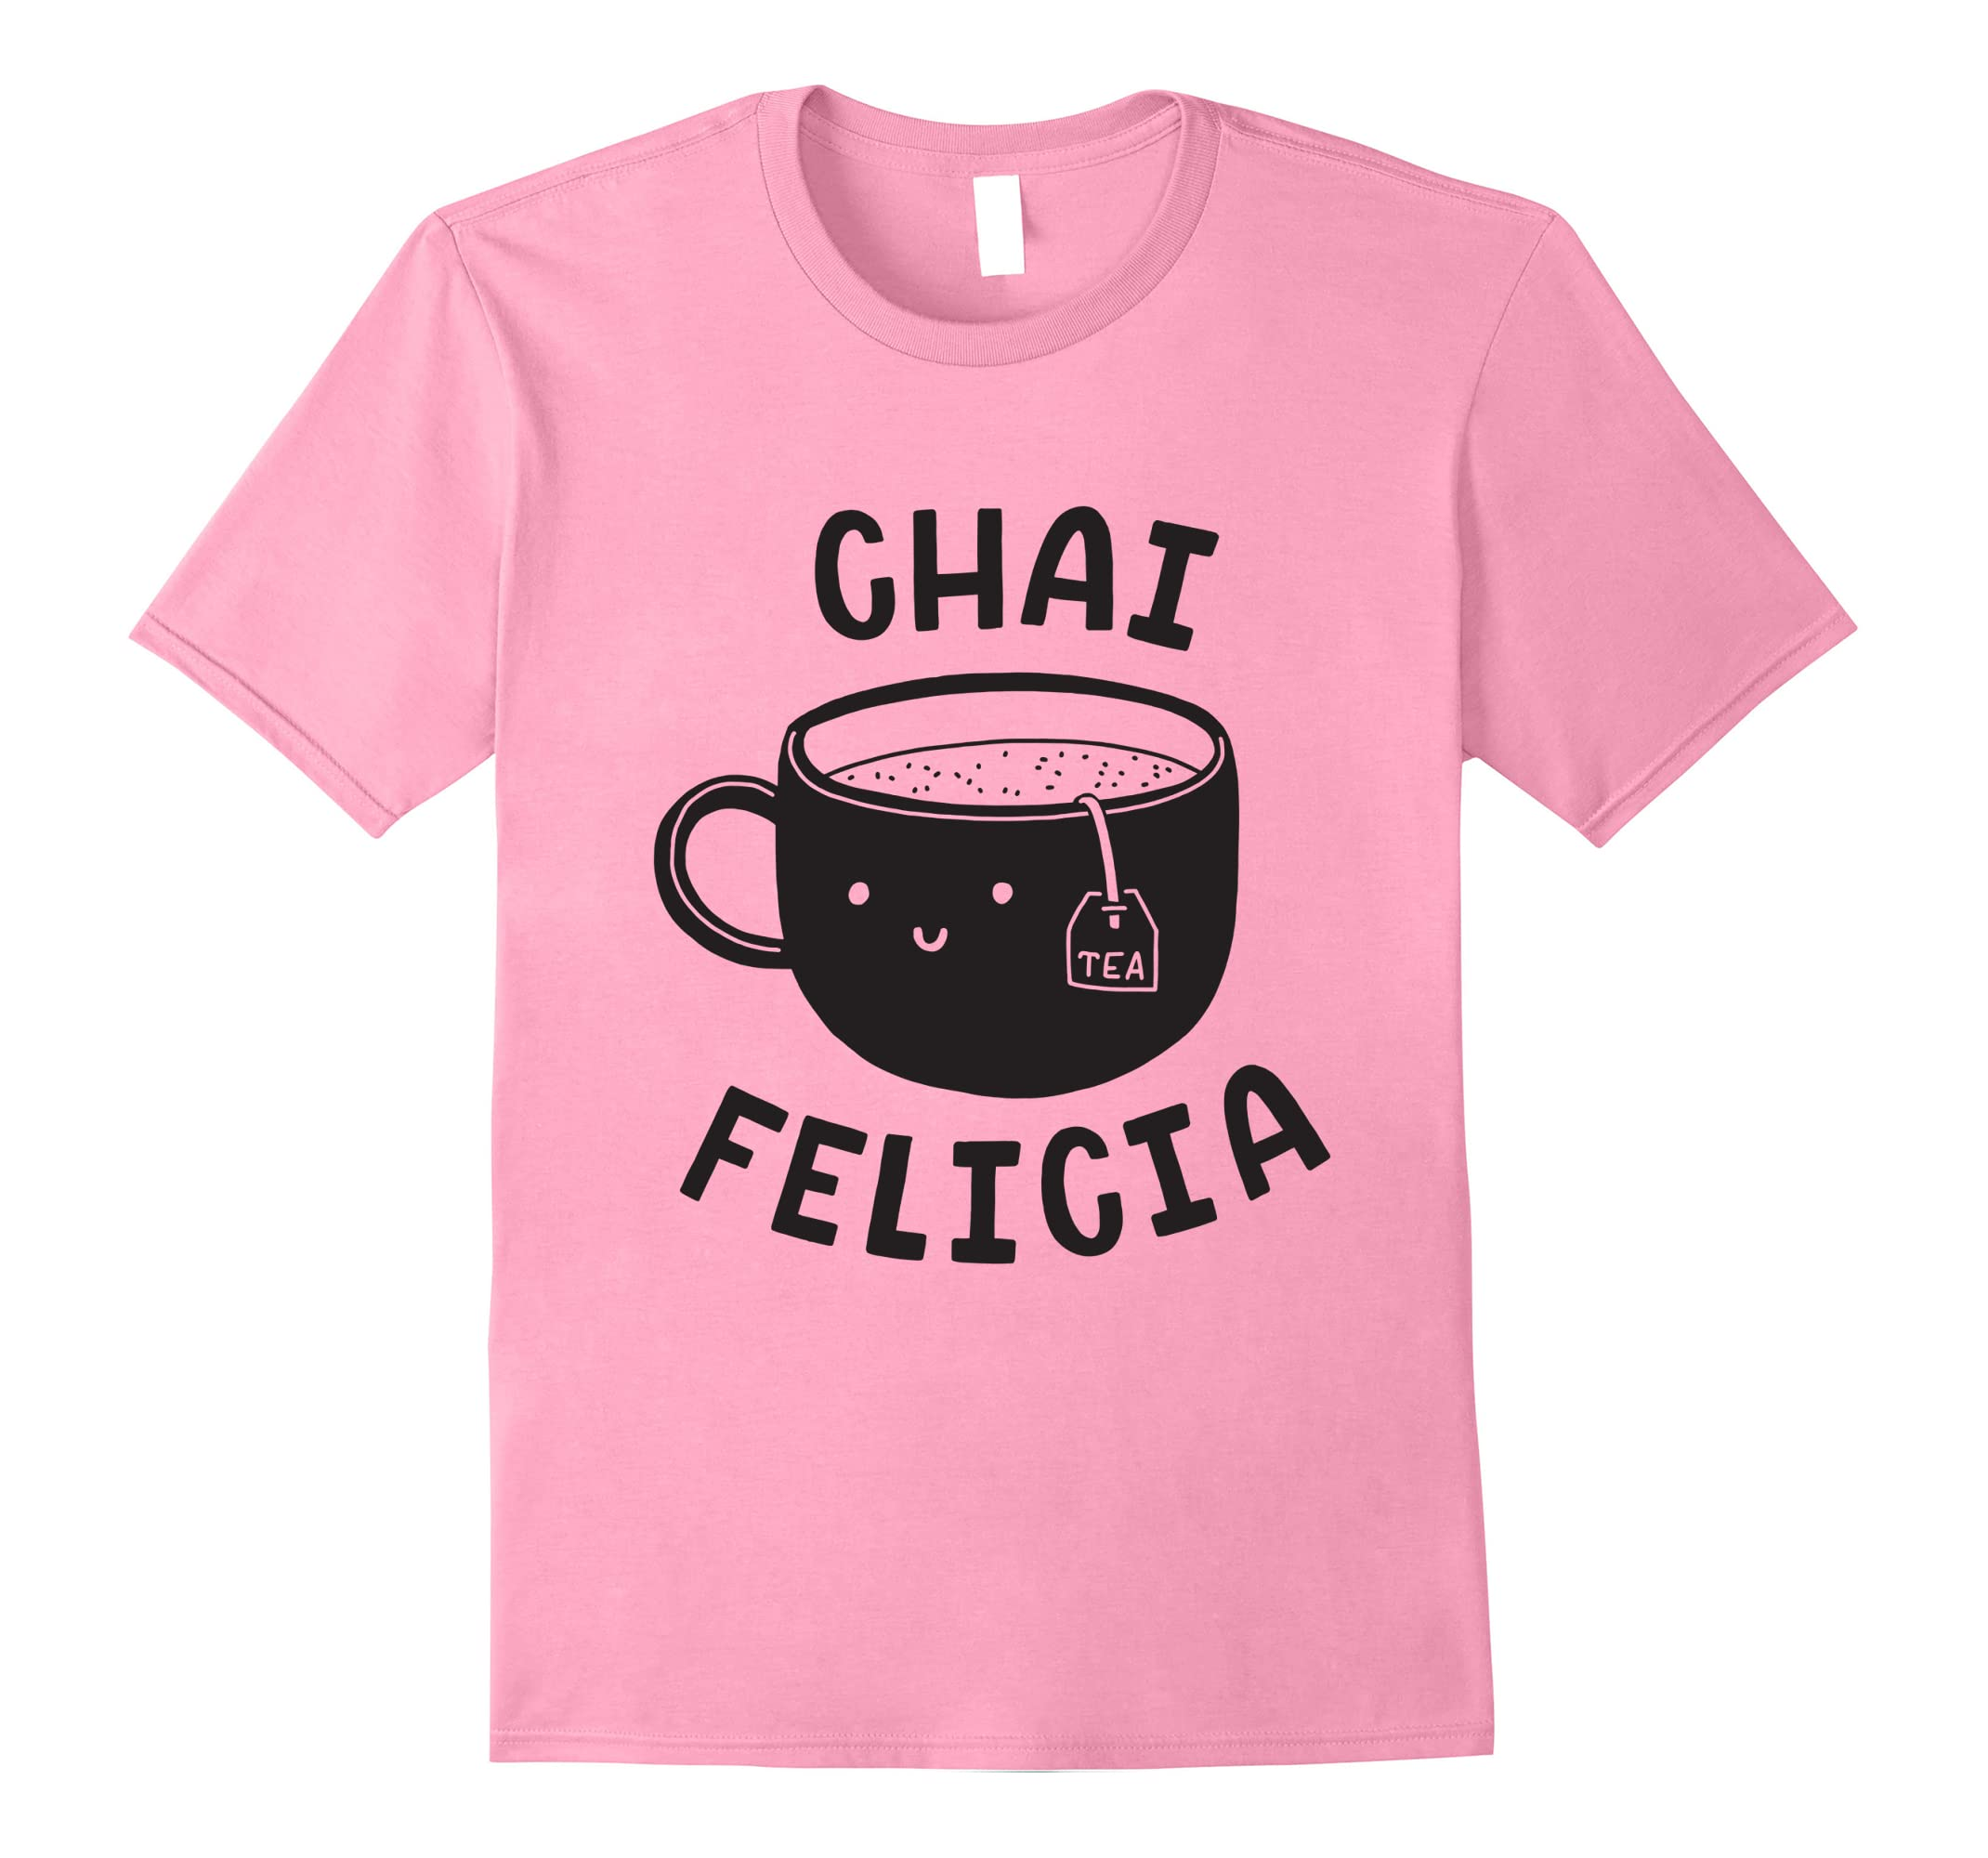 Chai Felicia T-Shirt - Funny Coffee Tee Pun-RT